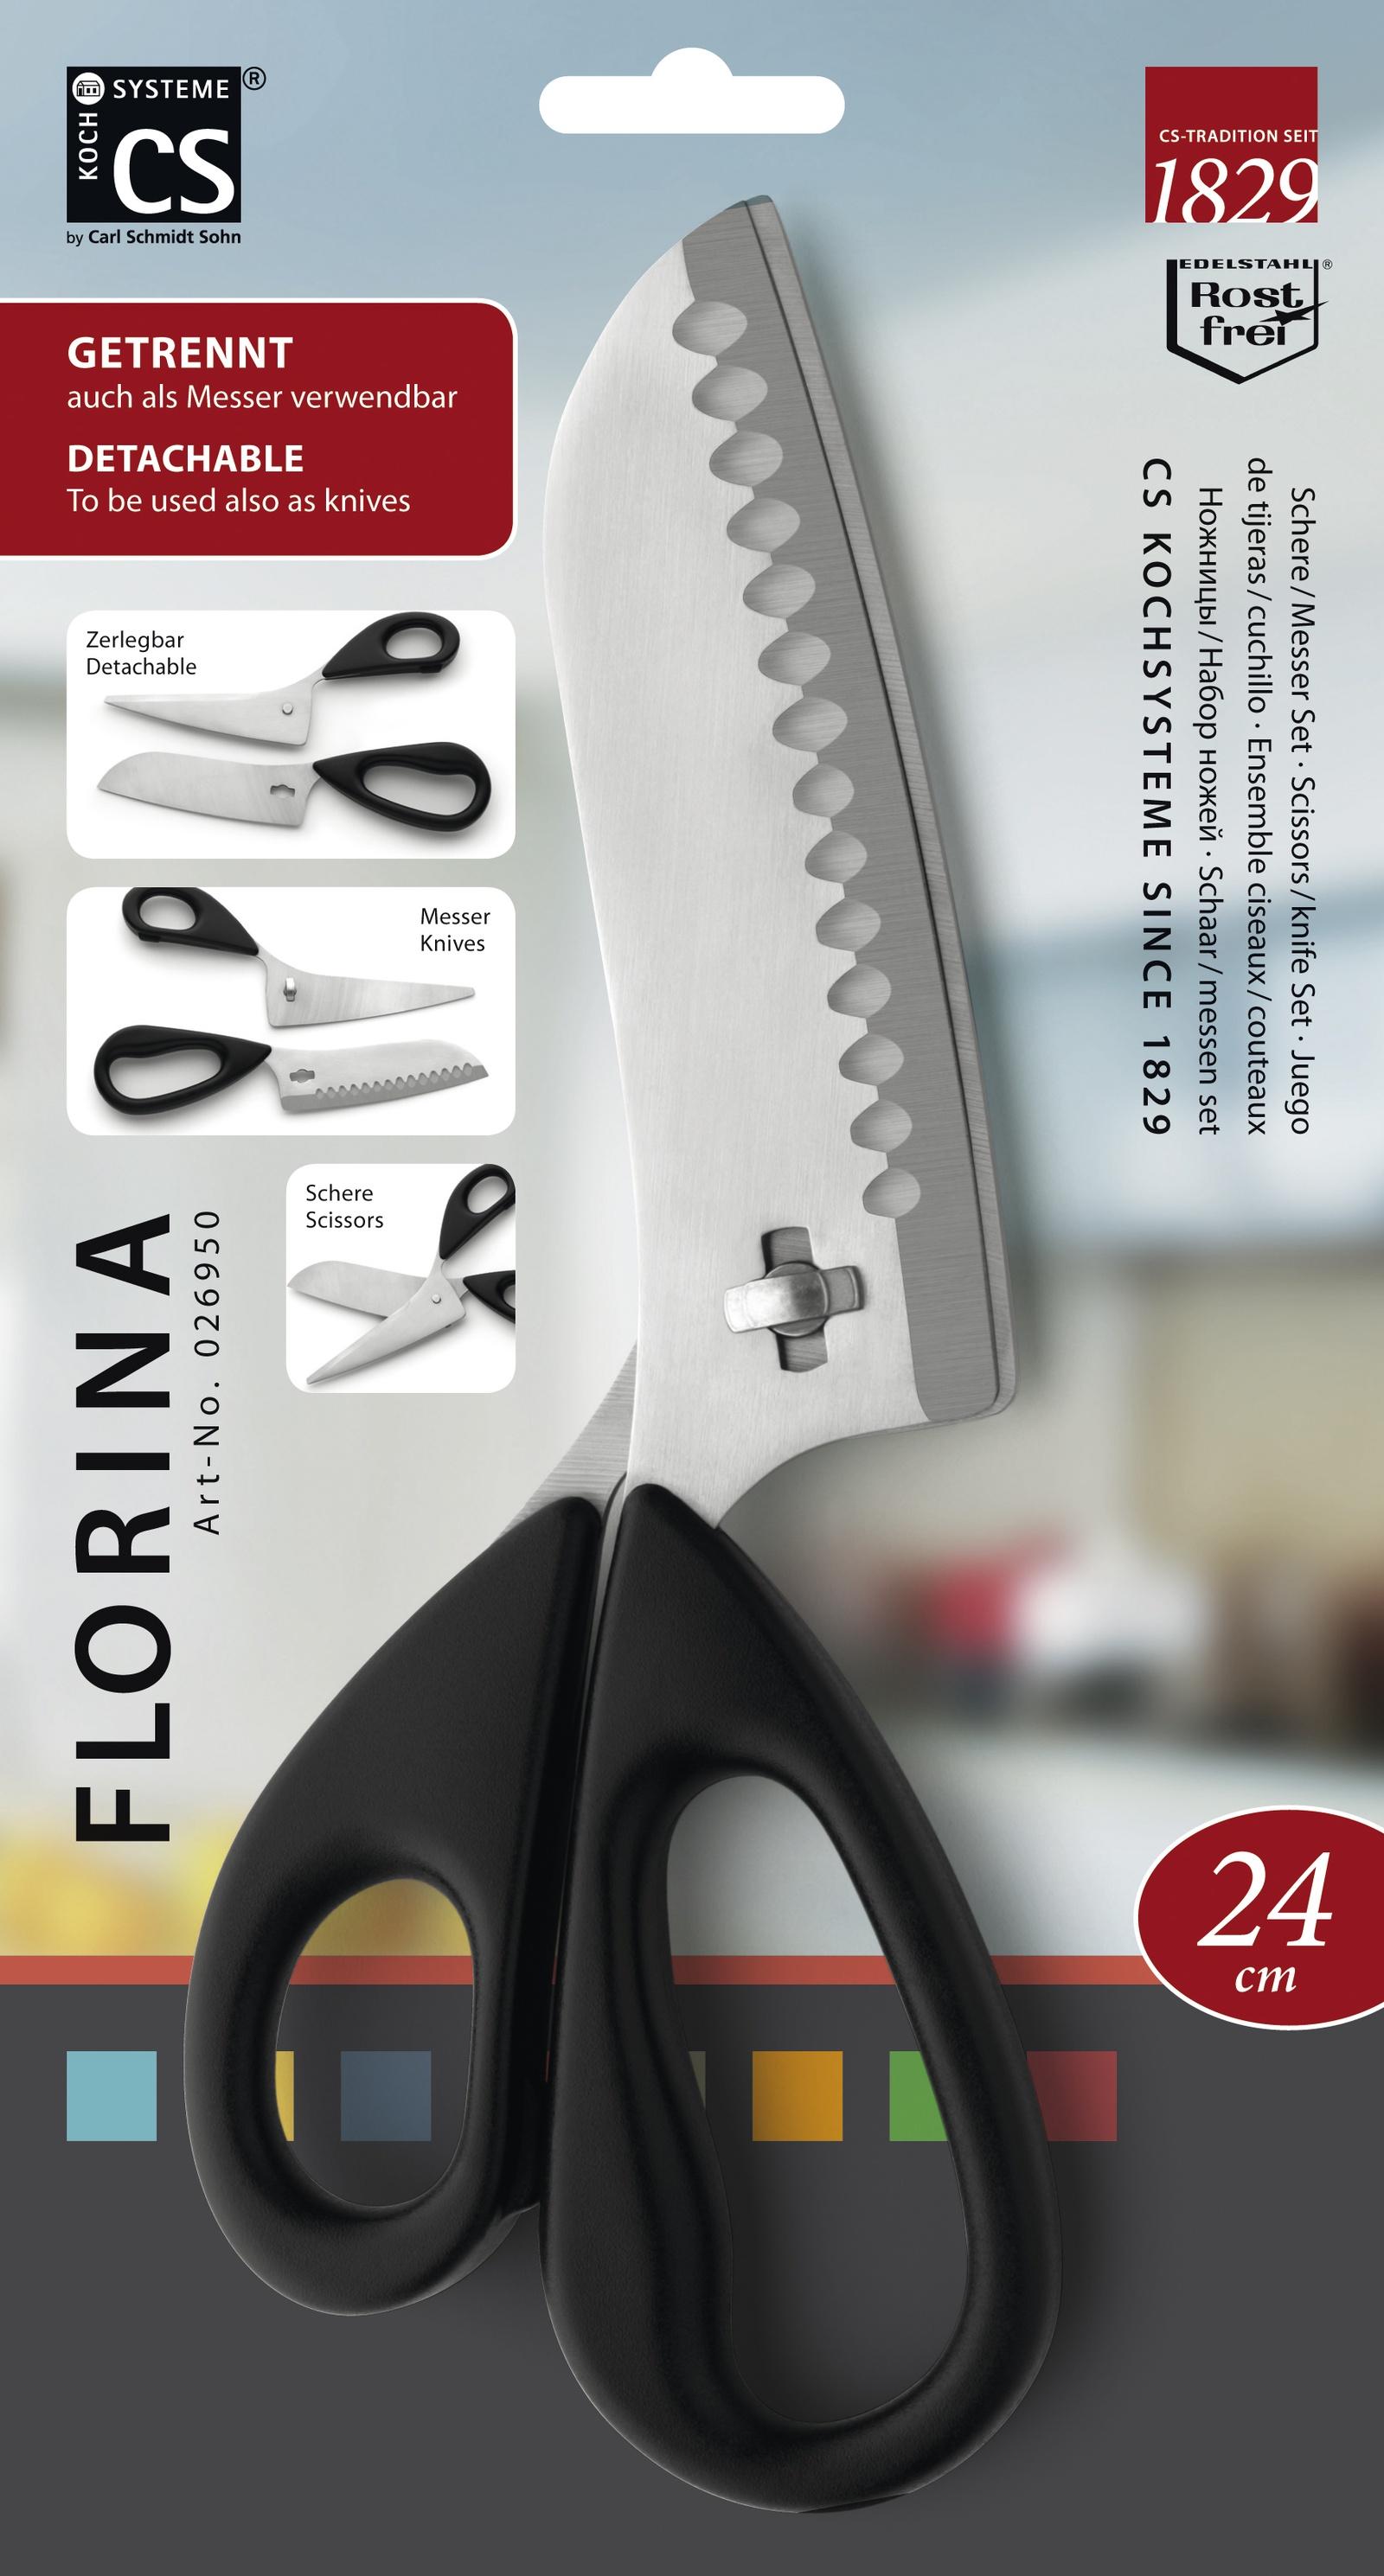 Ножницы кухонные CS-KOCHSYSTEME CS026950, CS026950, Нержавеющая сталь